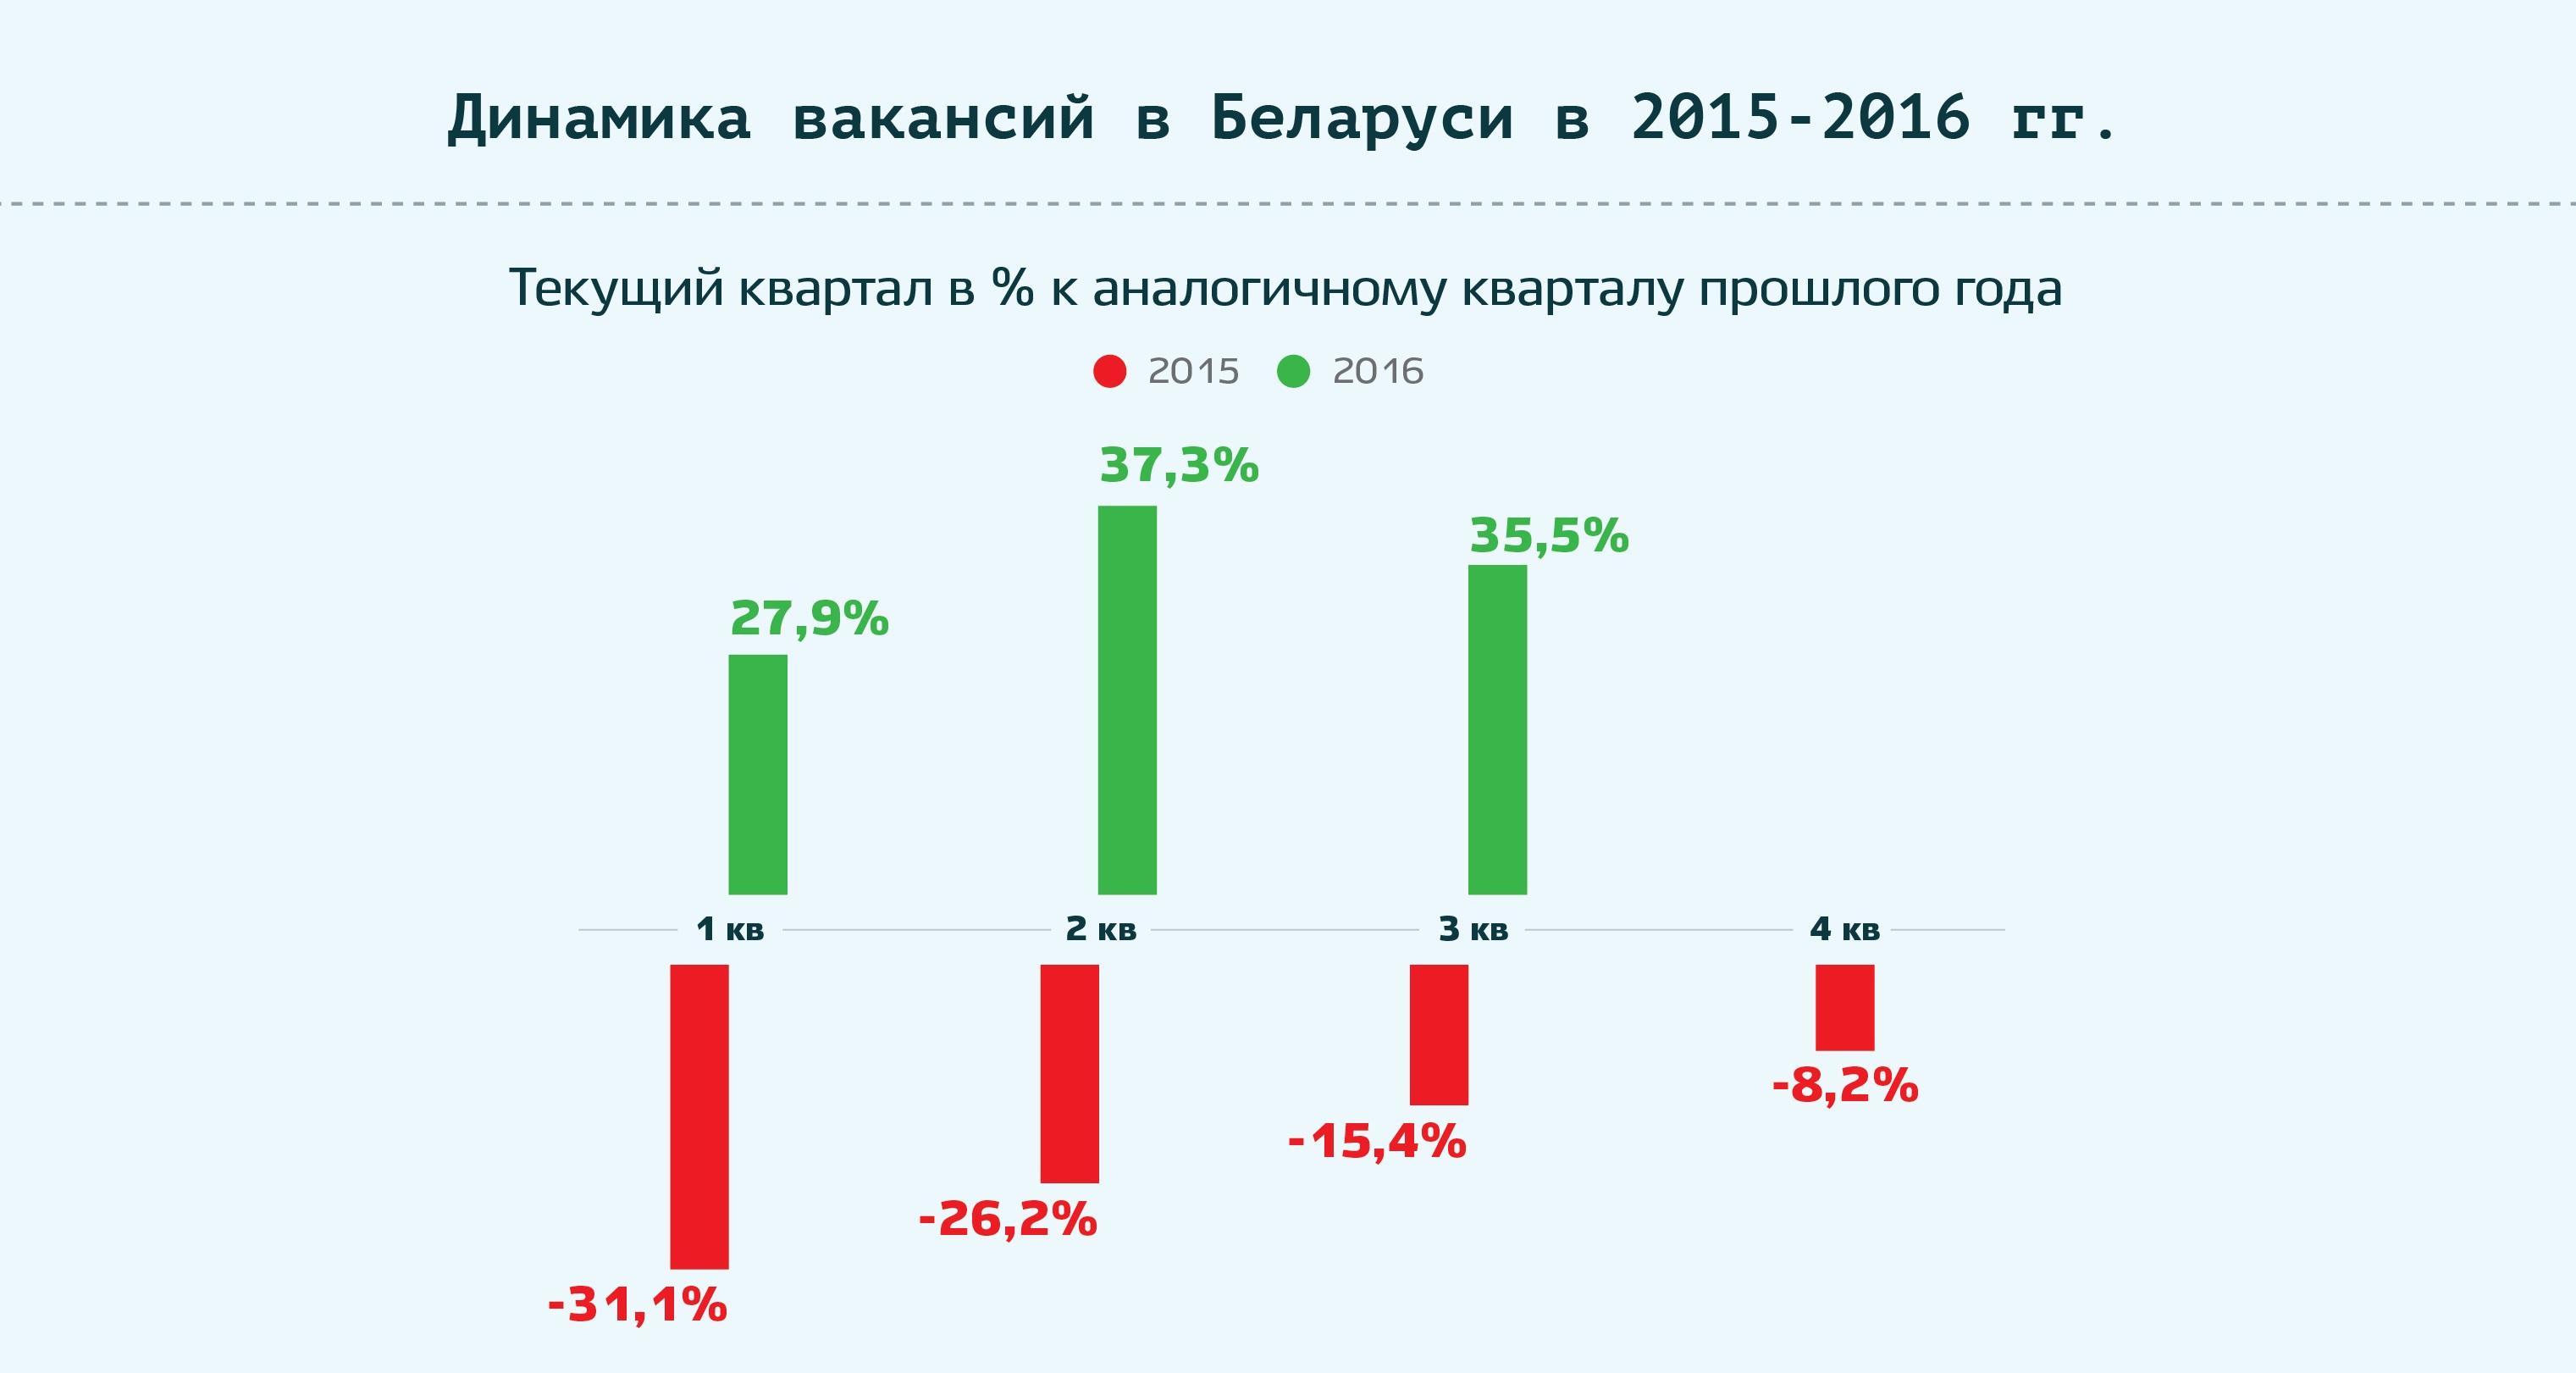 Итог 3-го квартала: рынок труда в цифрах